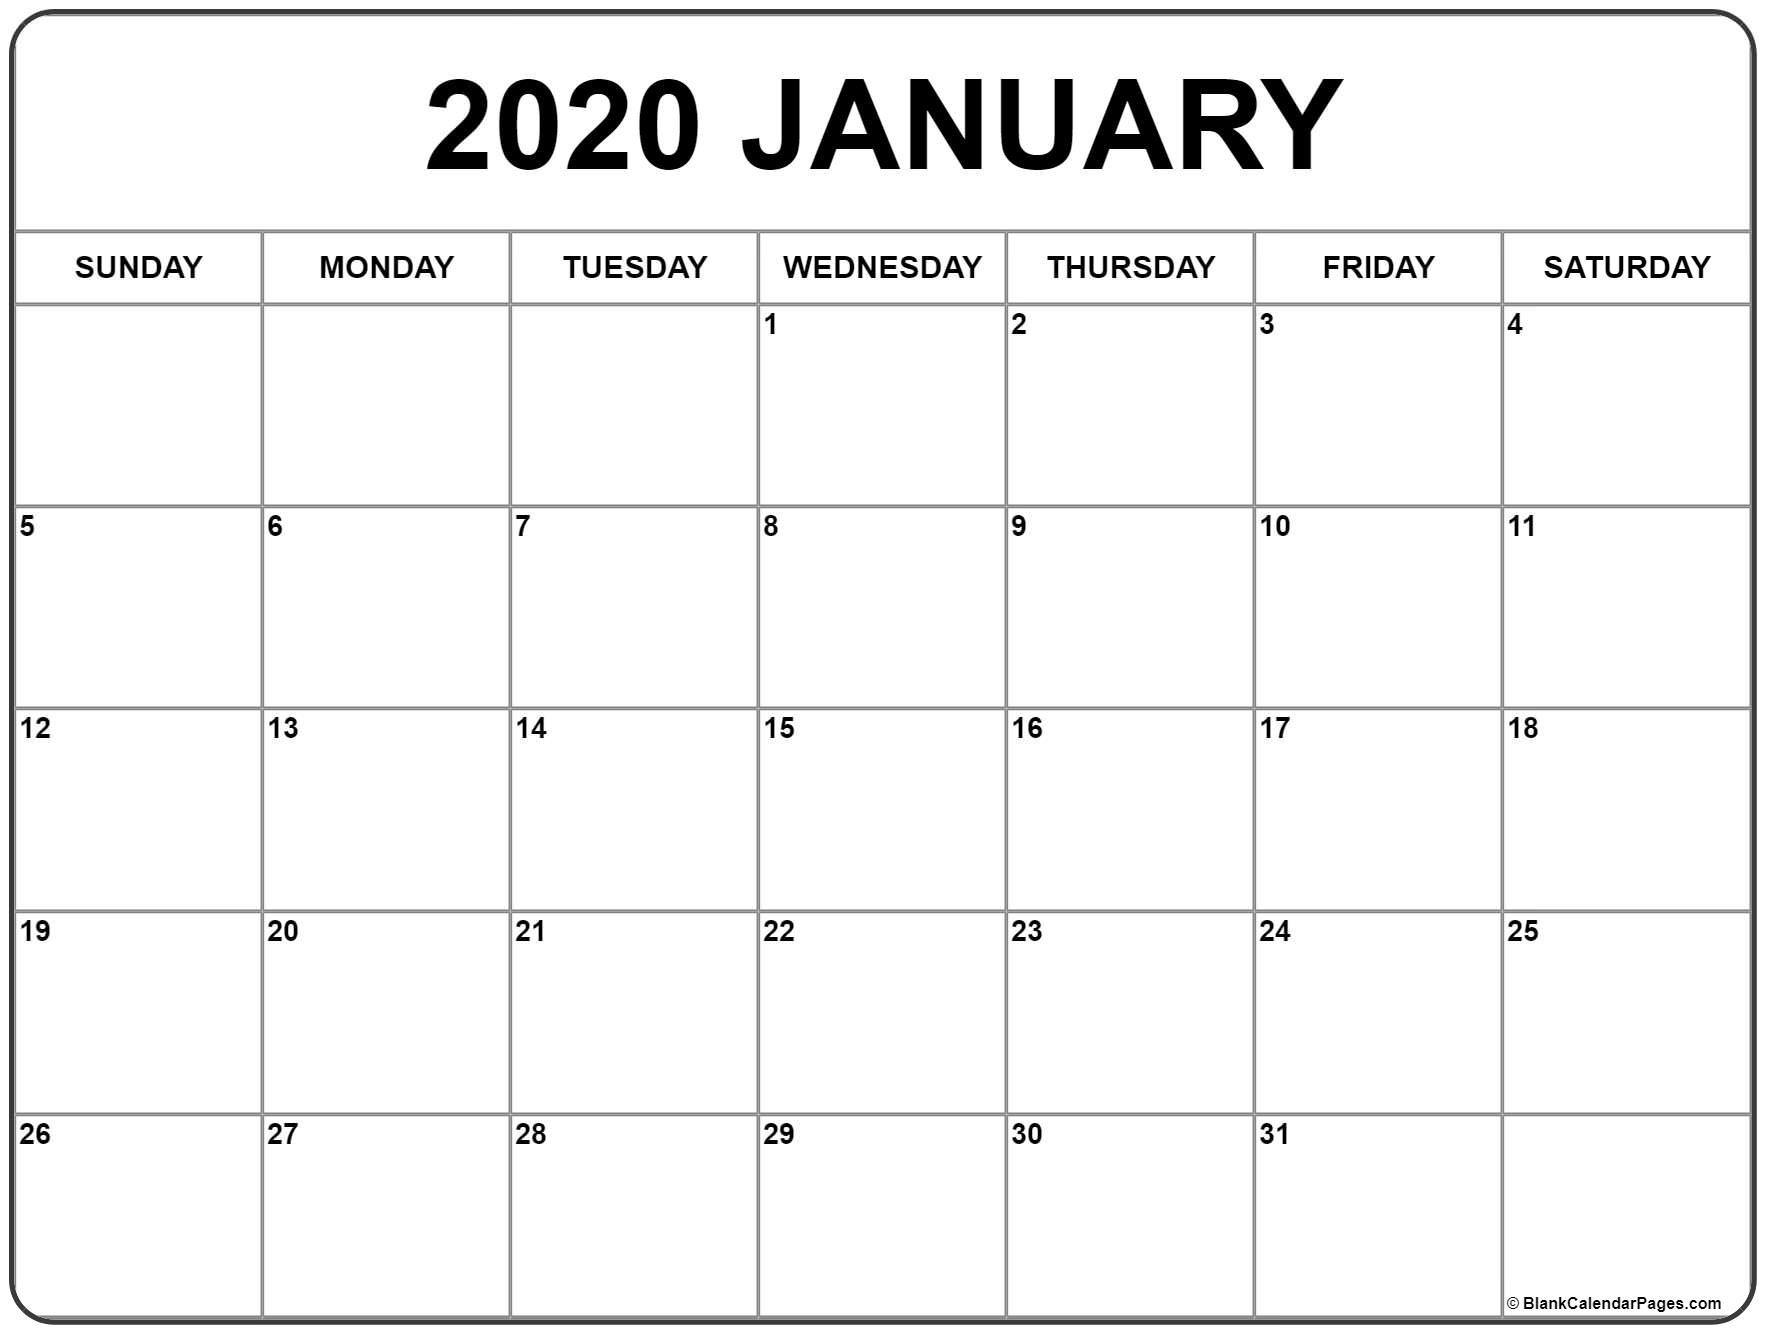 January 2020 Calendar | Free Printable Monthly Calendars with regard to Jan 2020 Printable Calendar